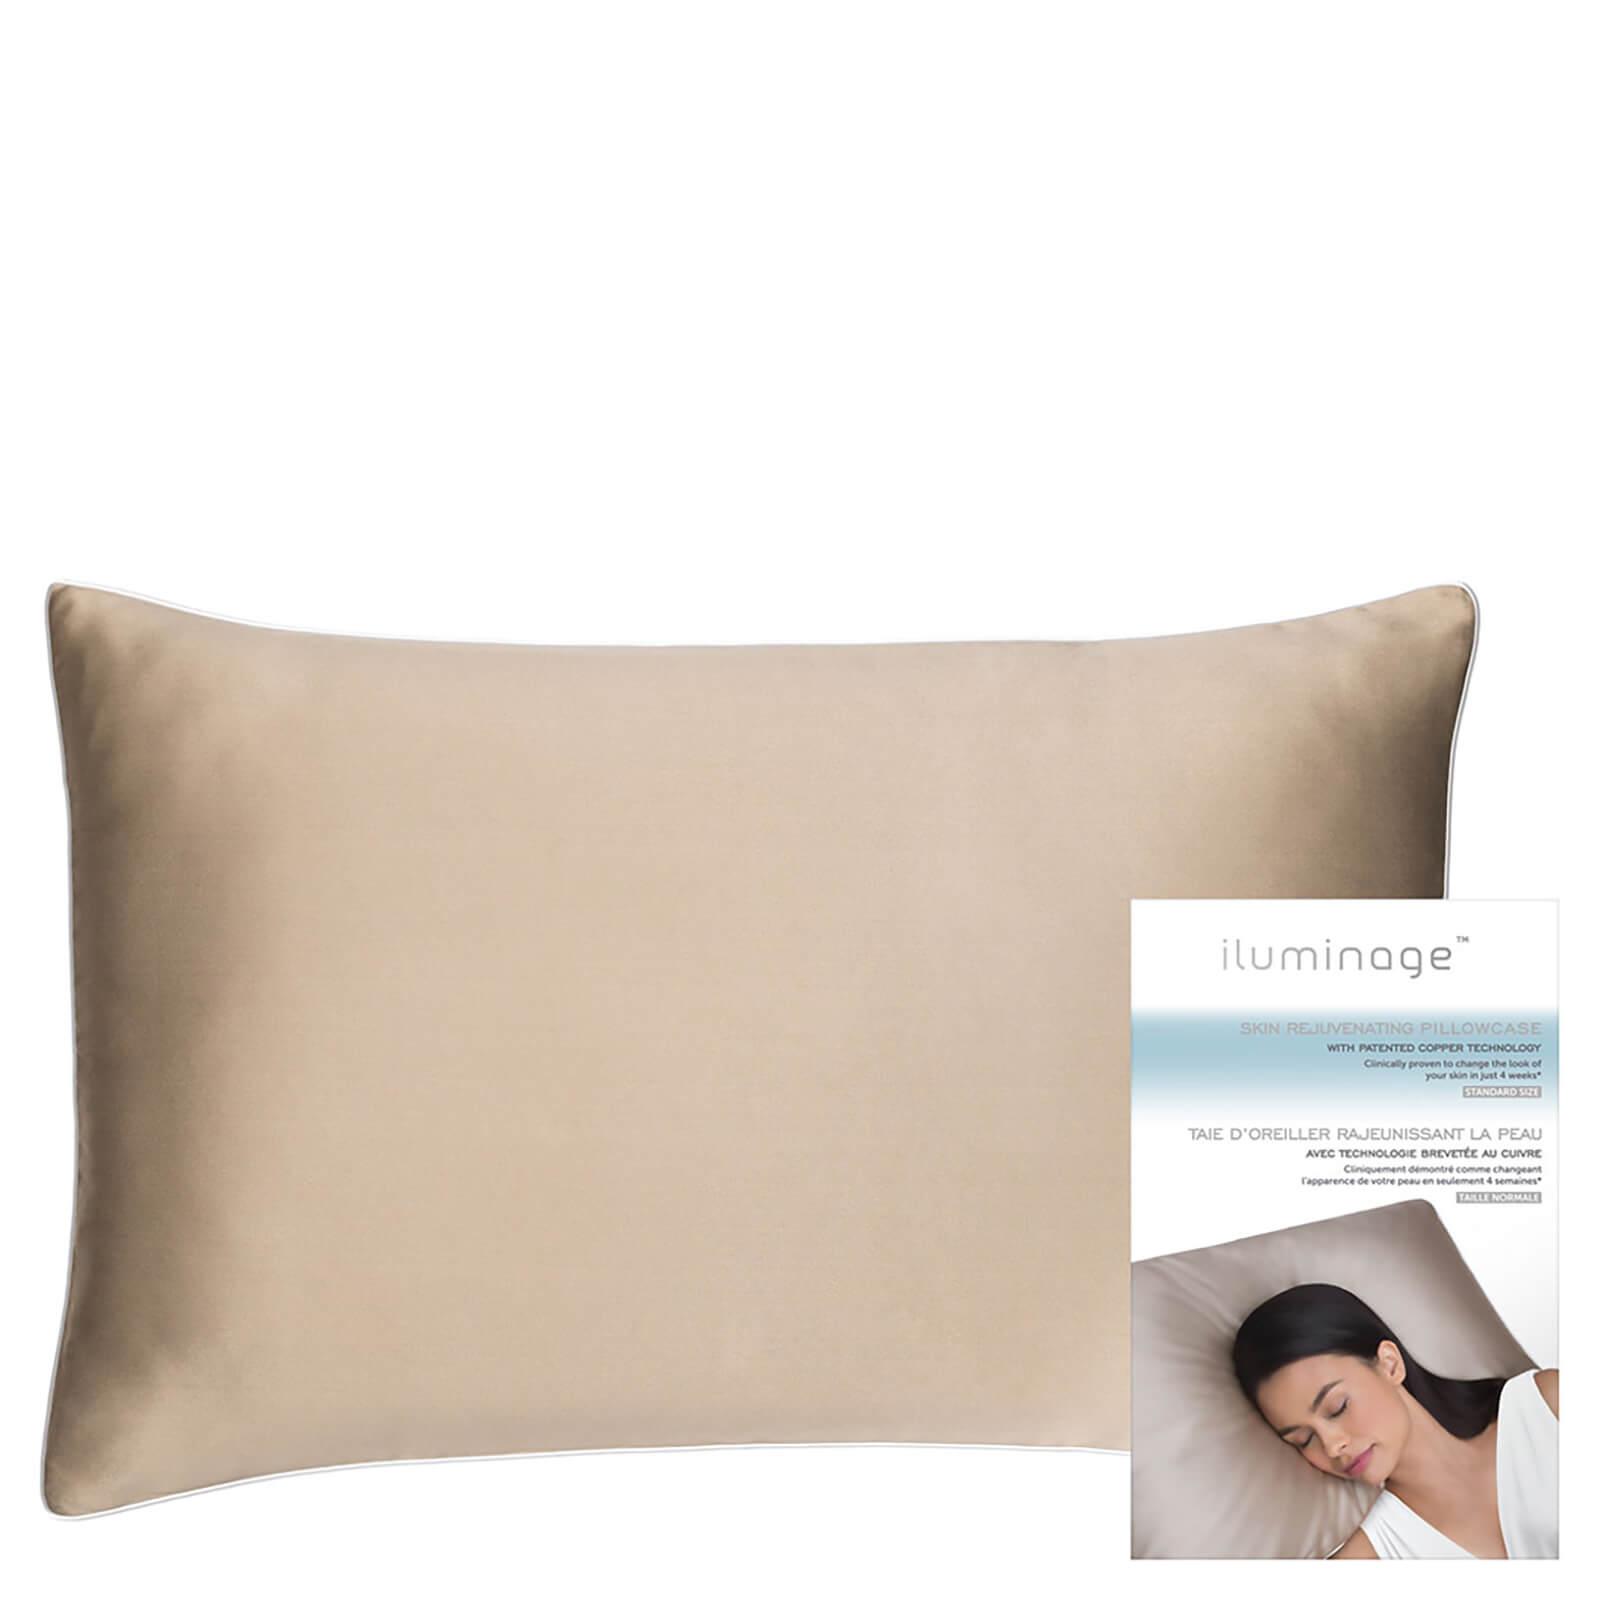 Iluminage Skin Rejuvenating Pillowcase - Standard Size